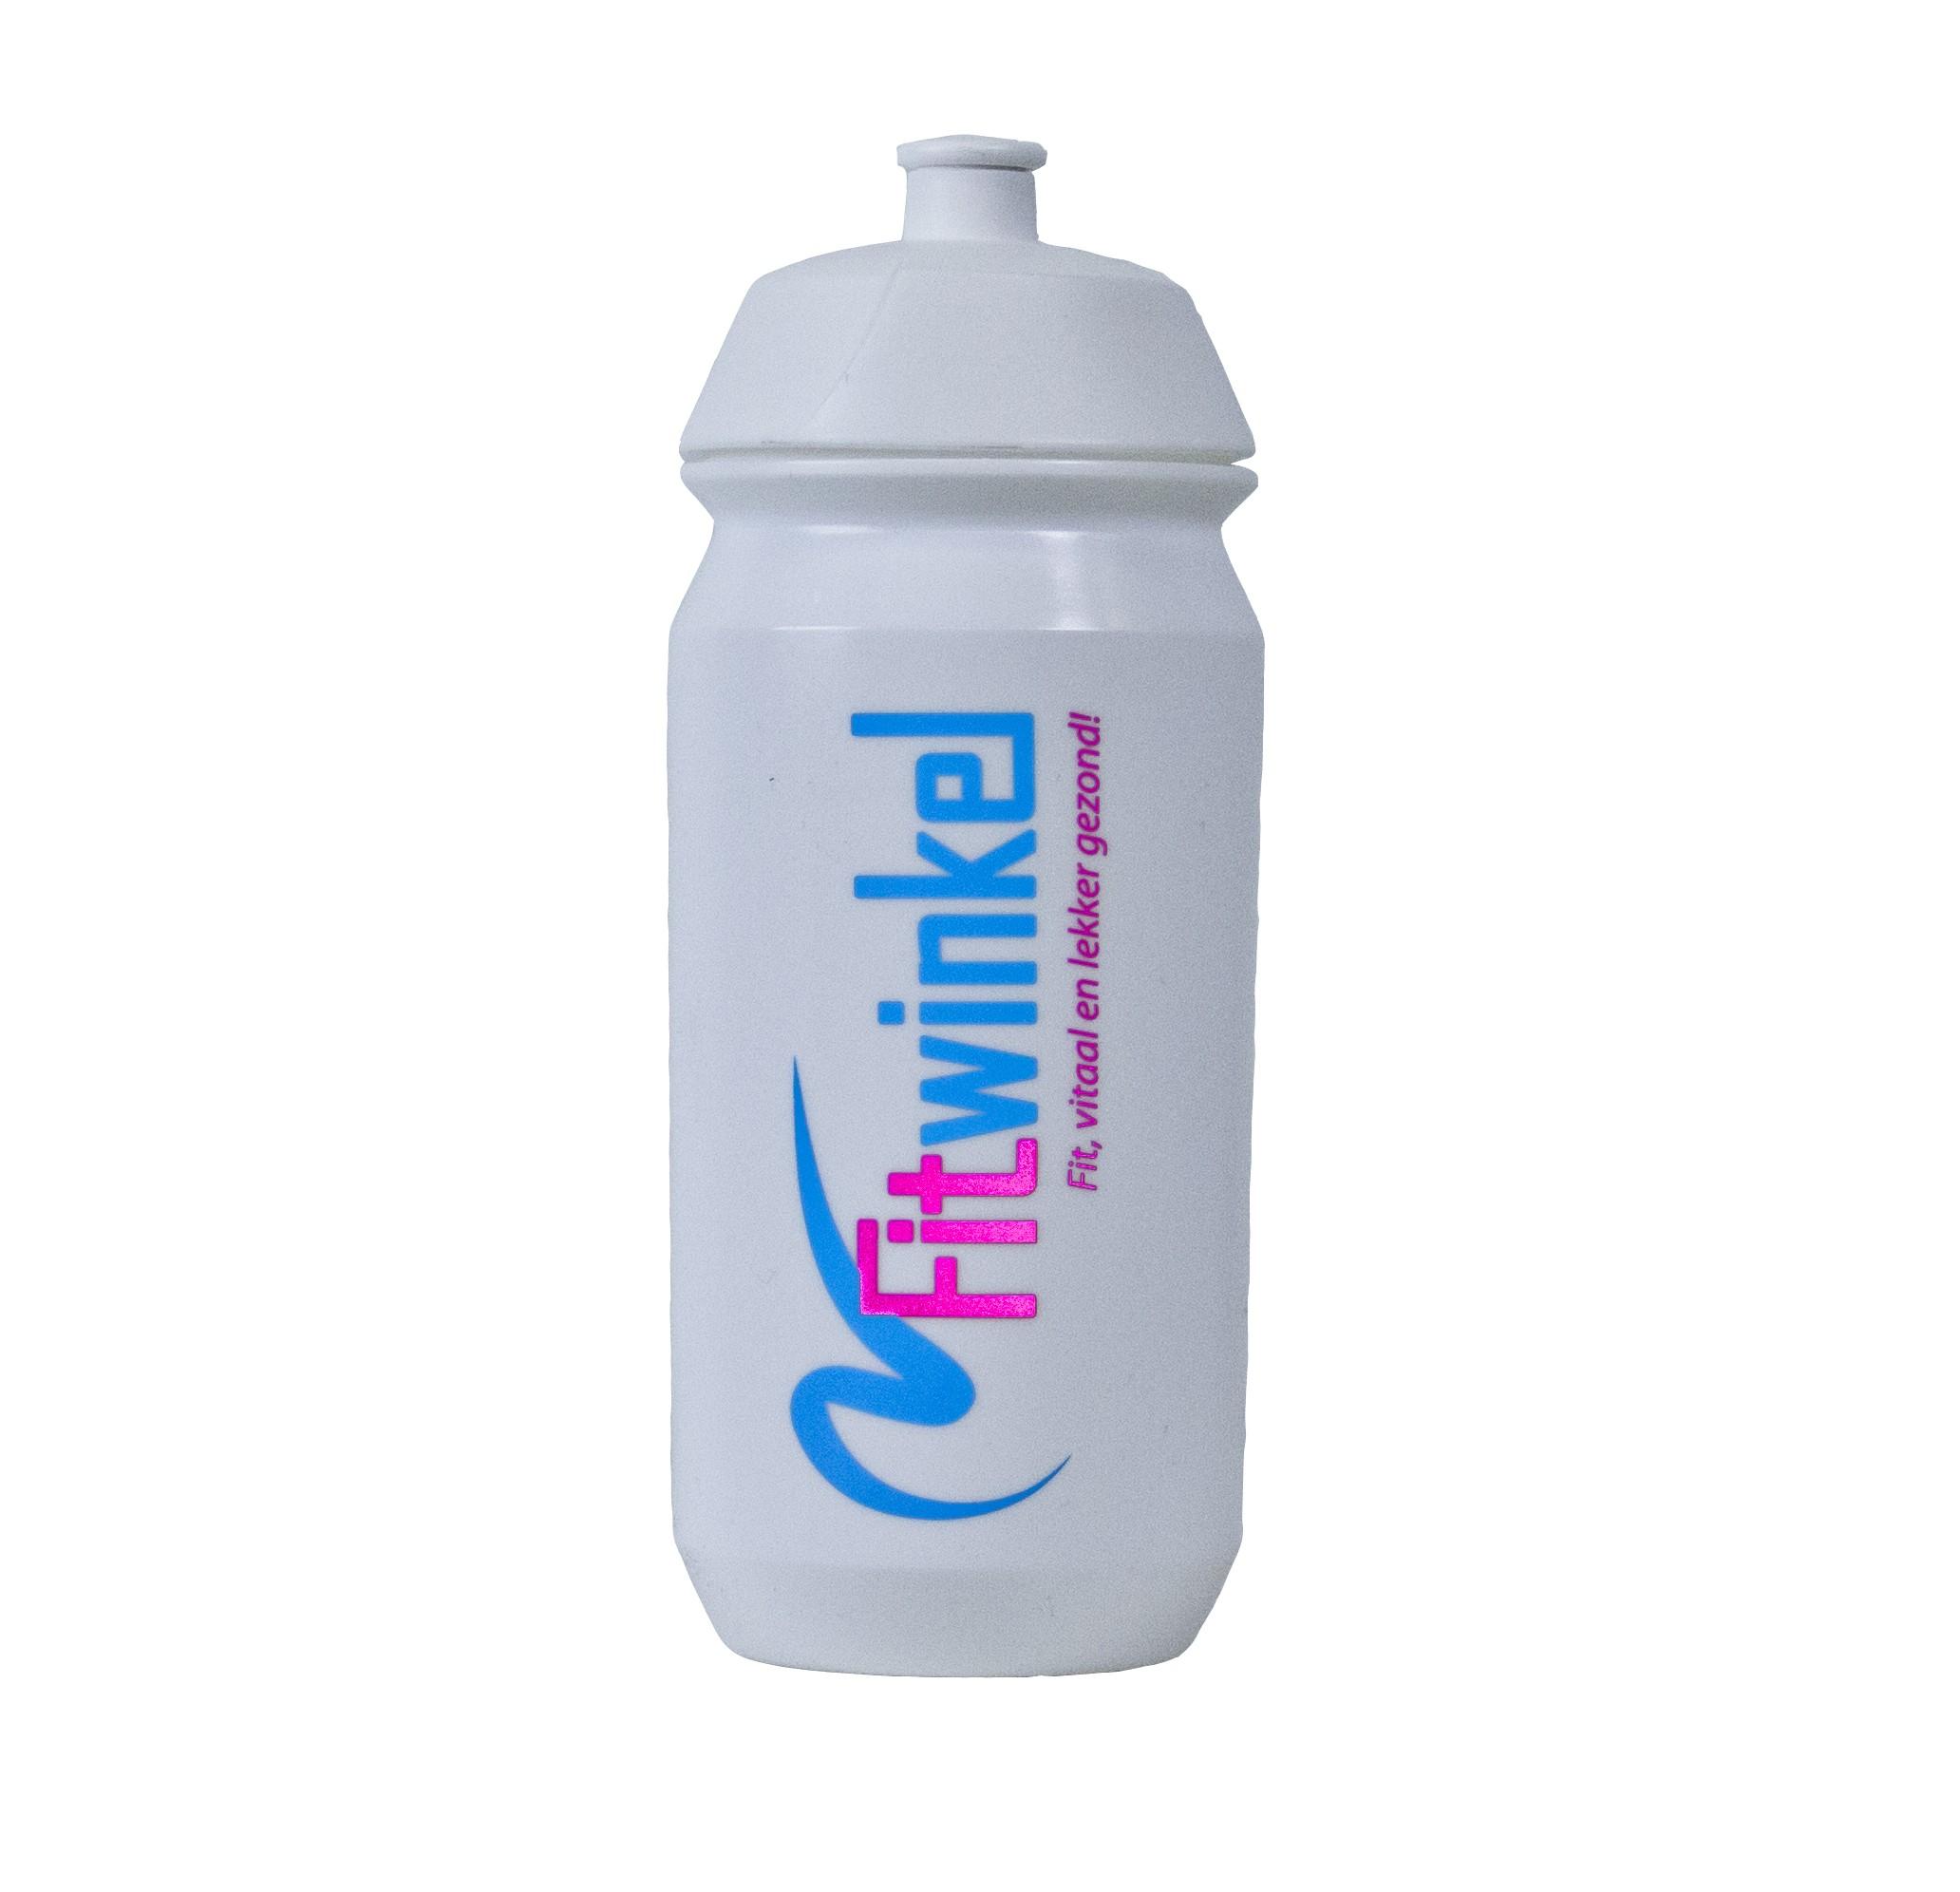 Fitwinkel Bidon 500 ml